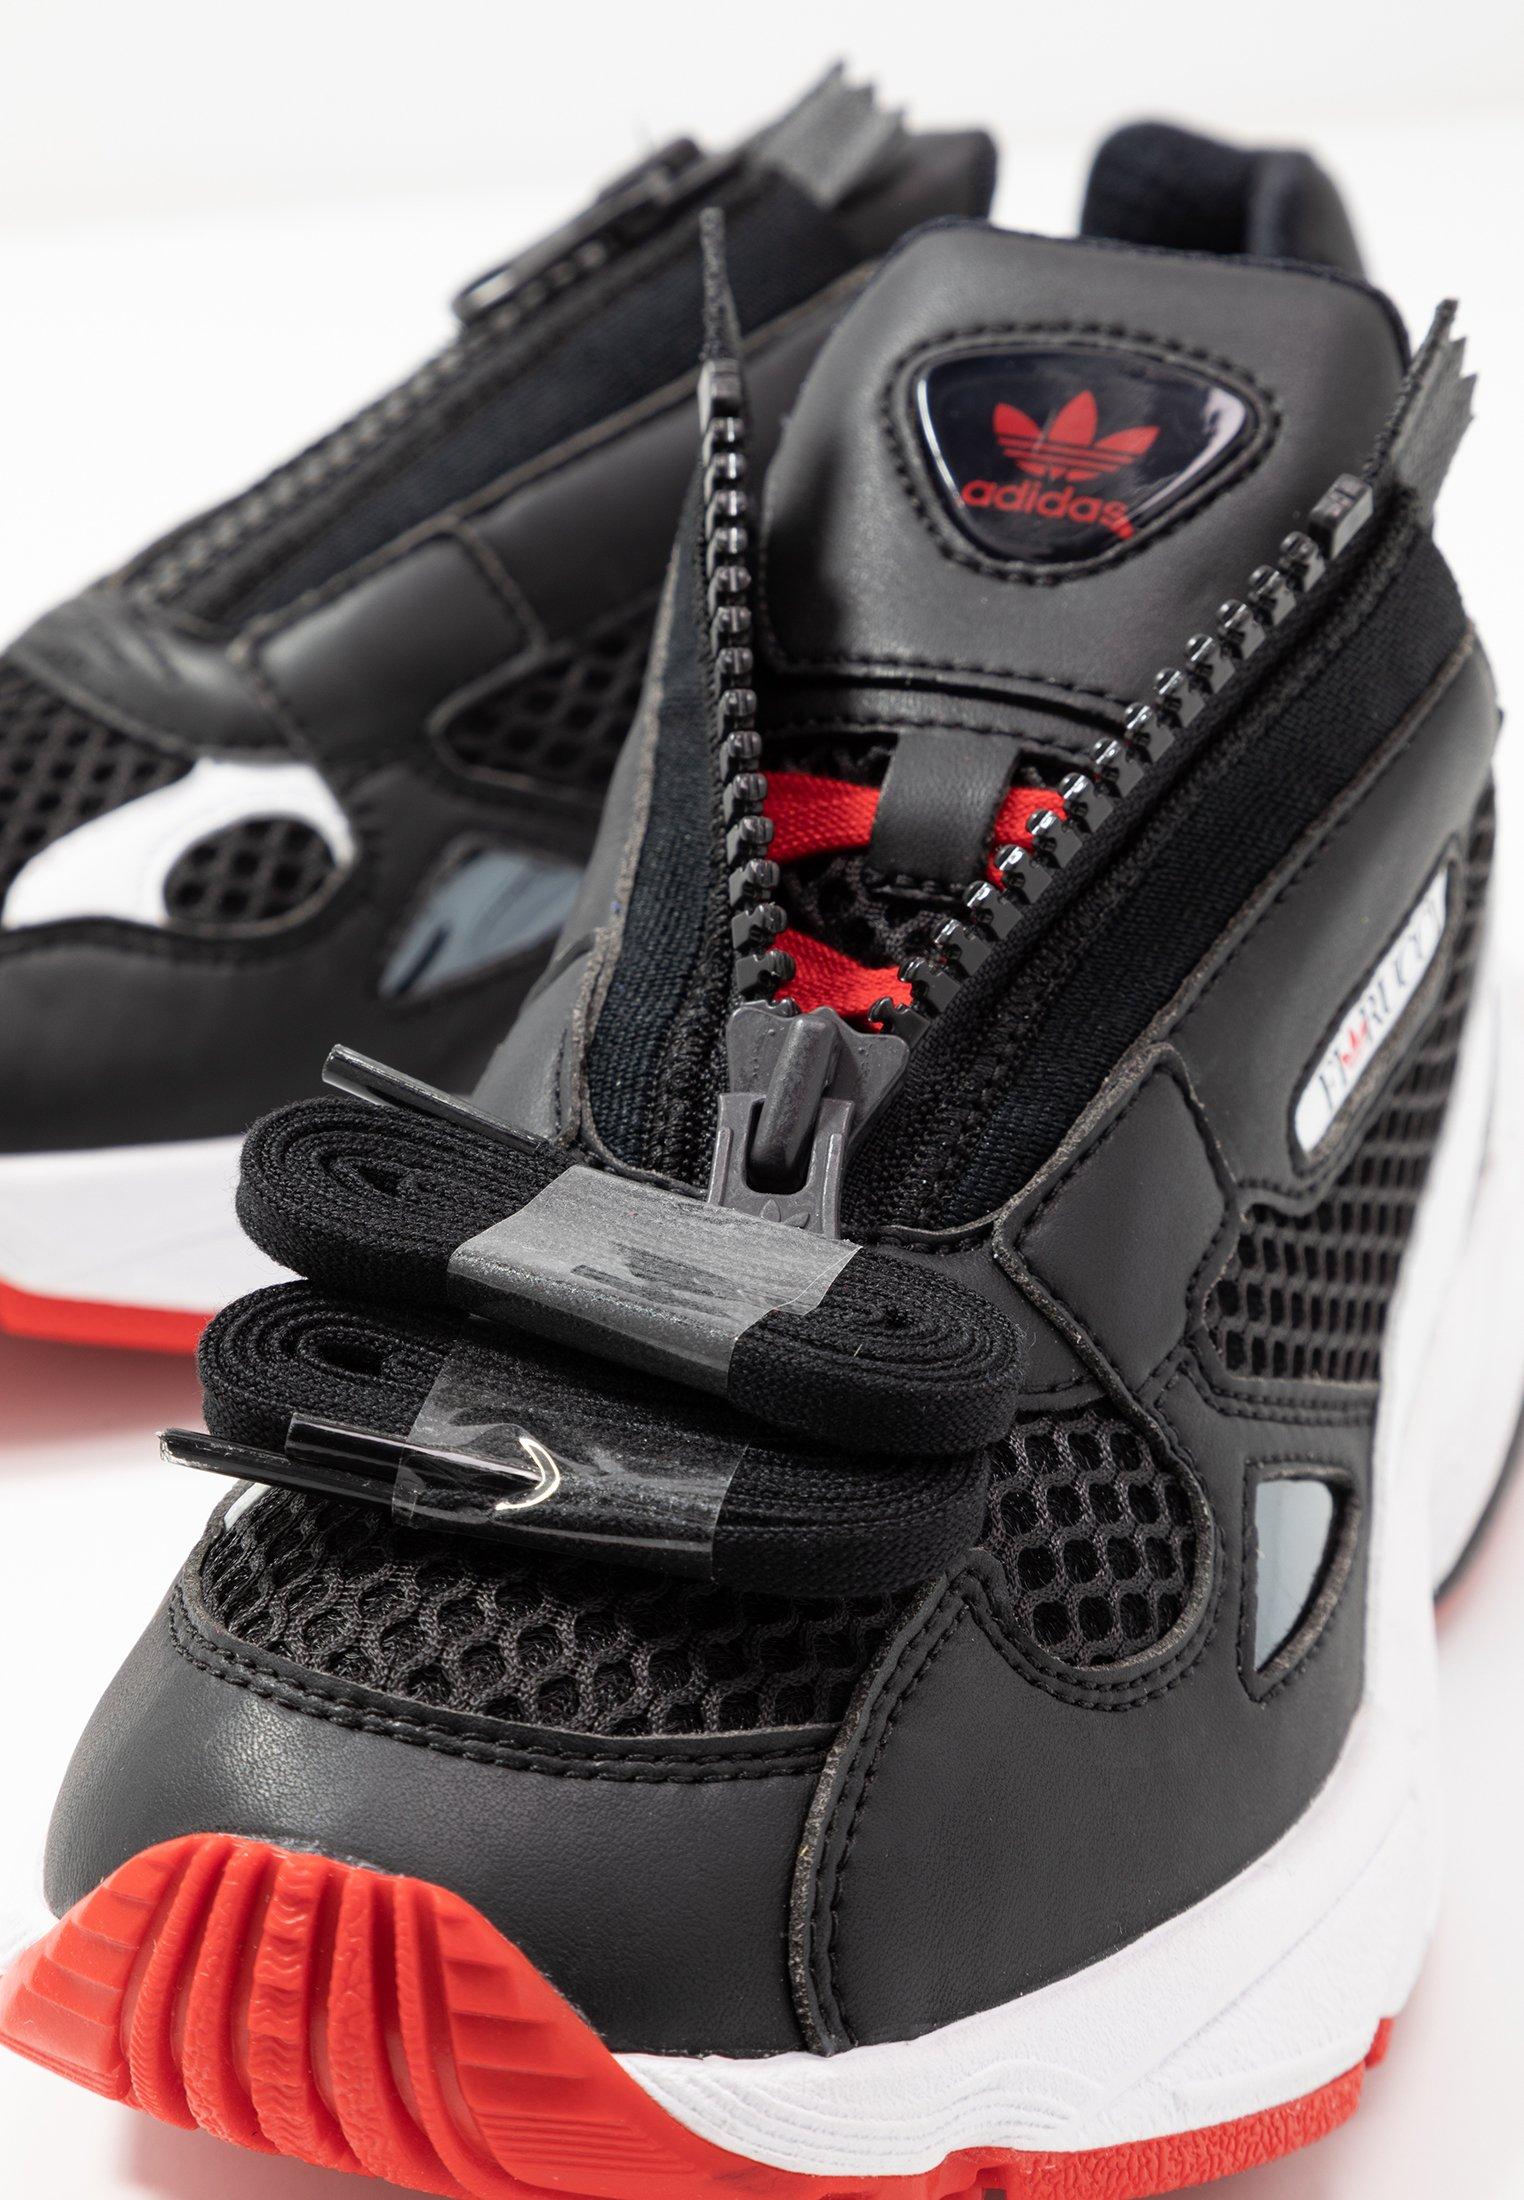 Adidas Originals Falcon Zip - Sneakers Core Black/footwear White/red